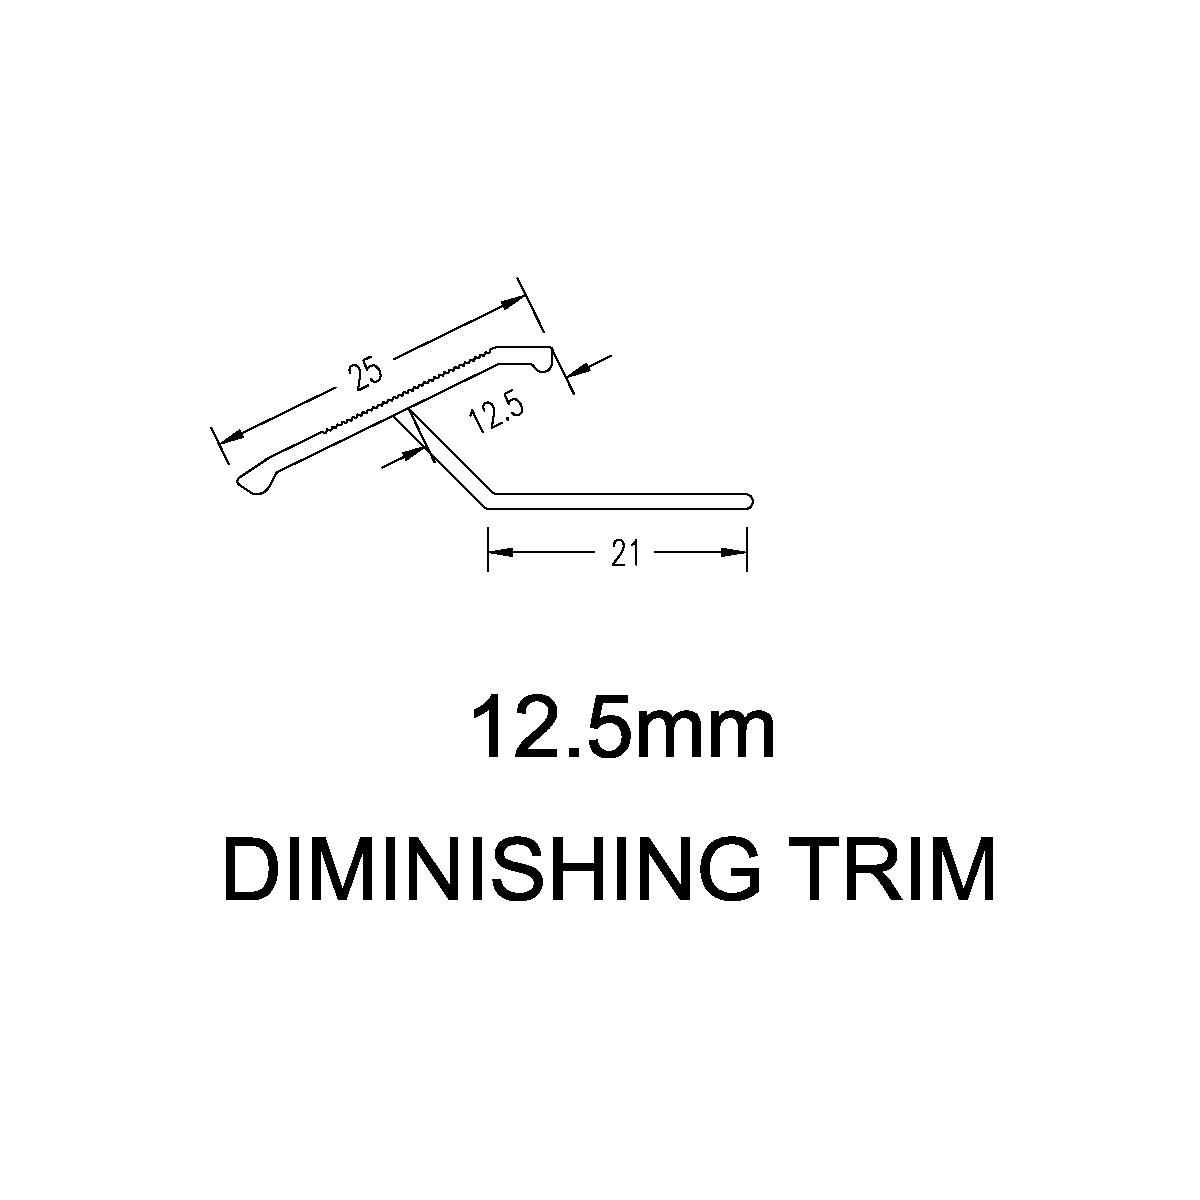 Diminishing Trim – 12mm